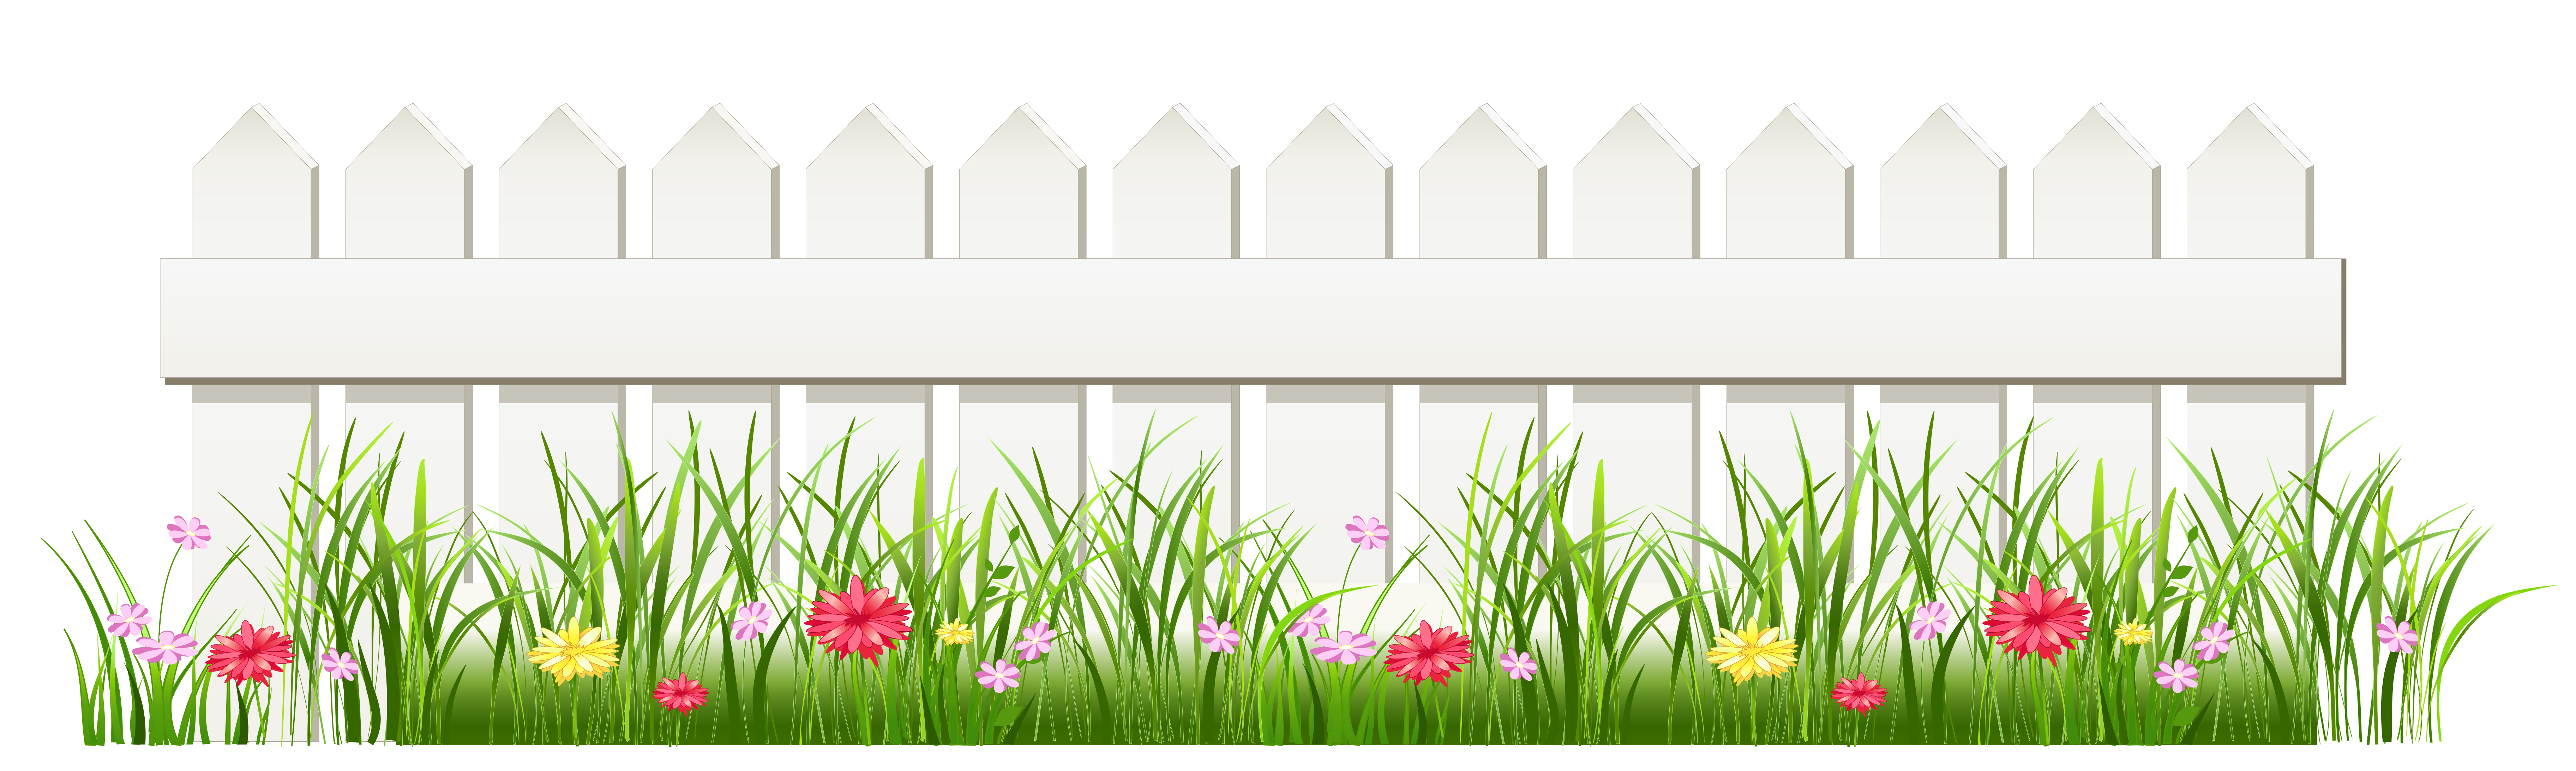 medium resolution of white fence grass derby backdrops superheroes clip art school stuff